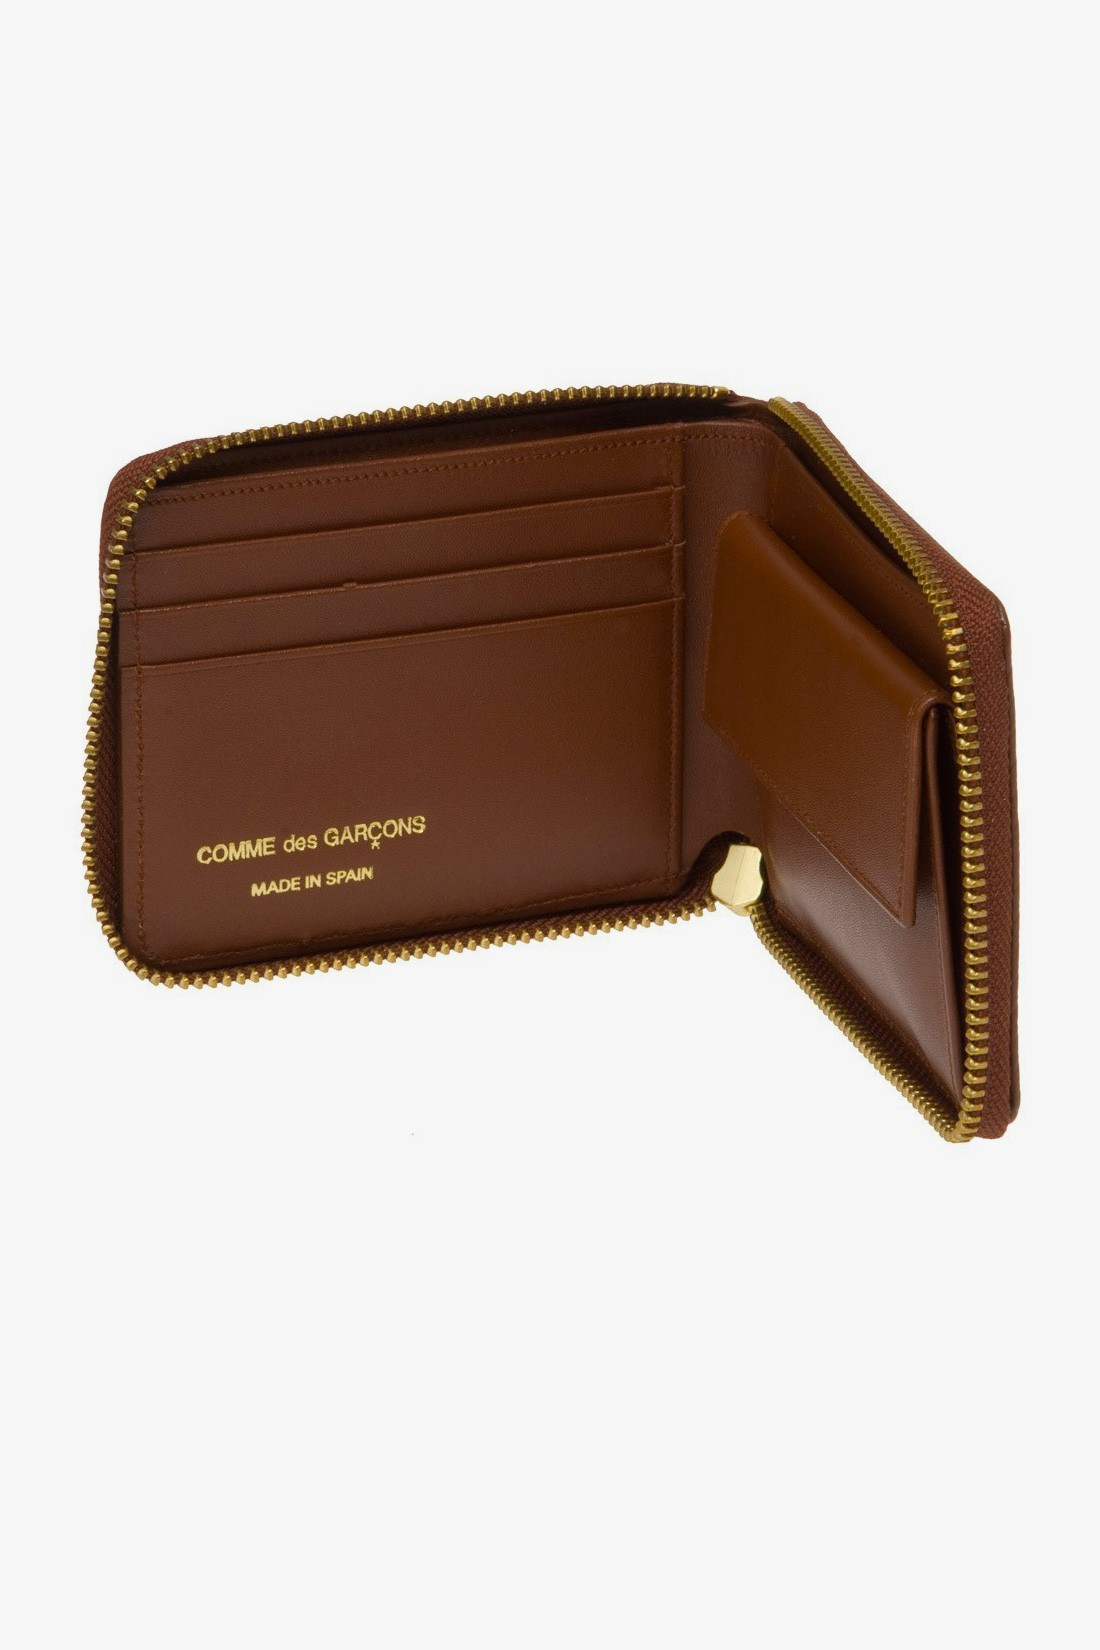 COMME DES GARÇONS WALLETS / Cdg luxury group sa7100lg Brown